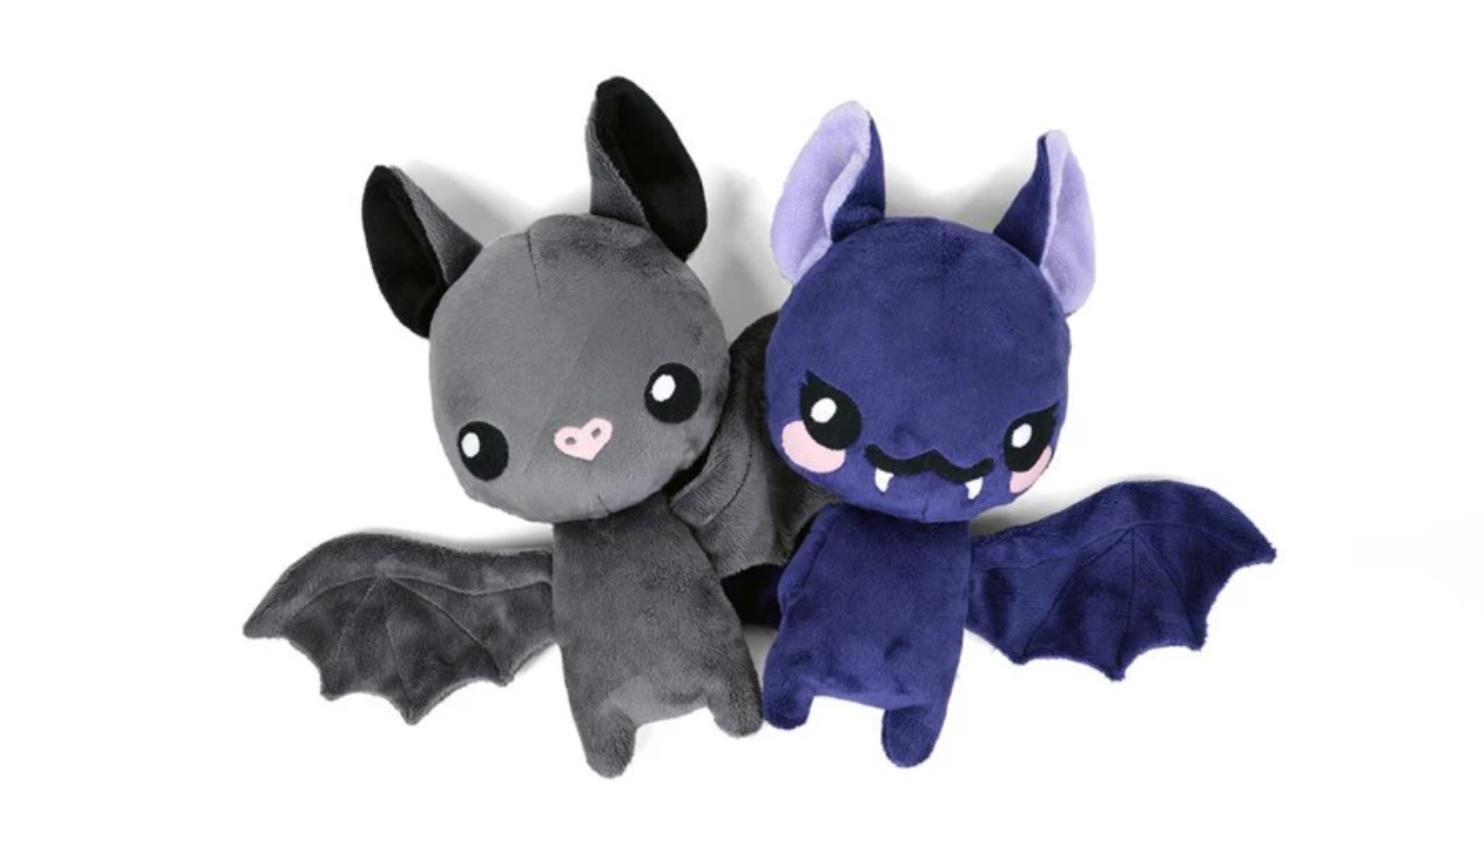 bat plush toys